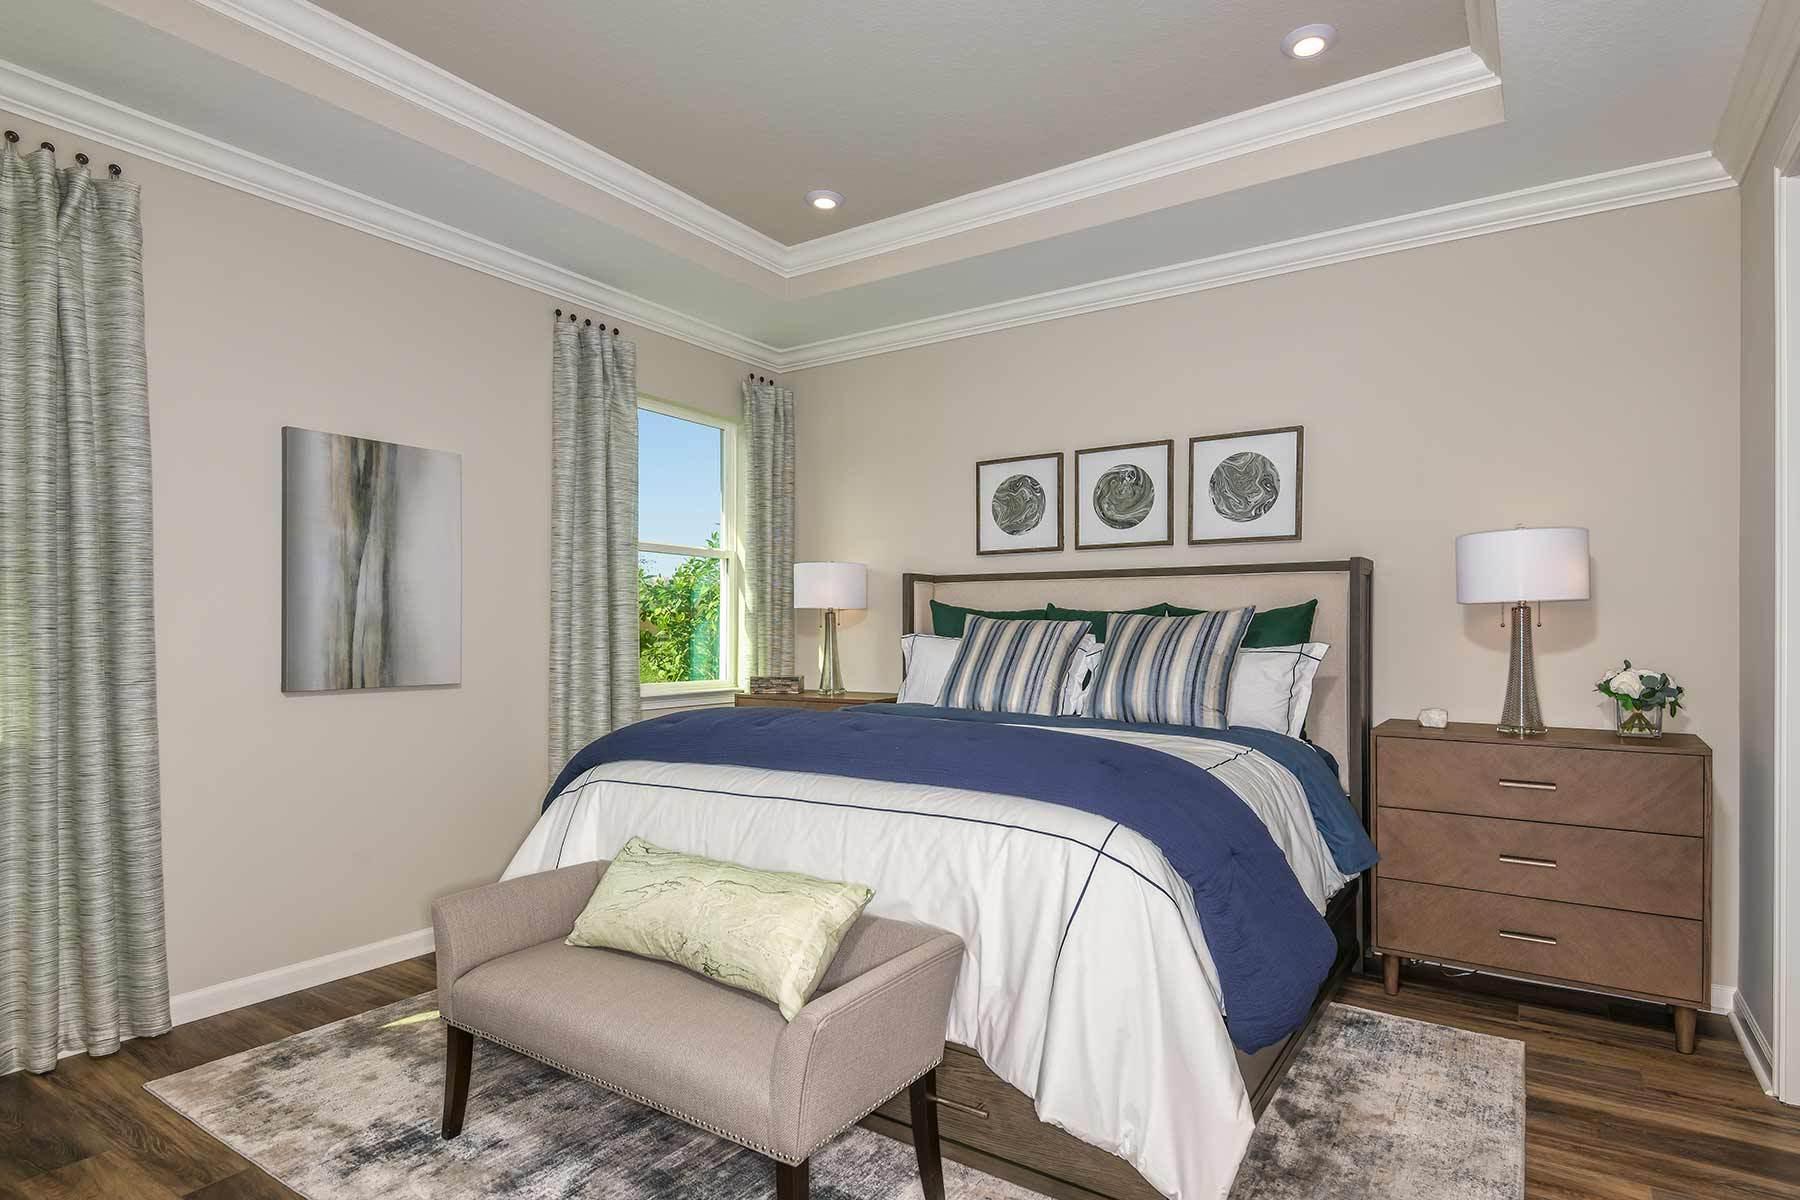 Bedroom featured in the Largo By Mattamy Homes in Sarasota-Bradenton, FL